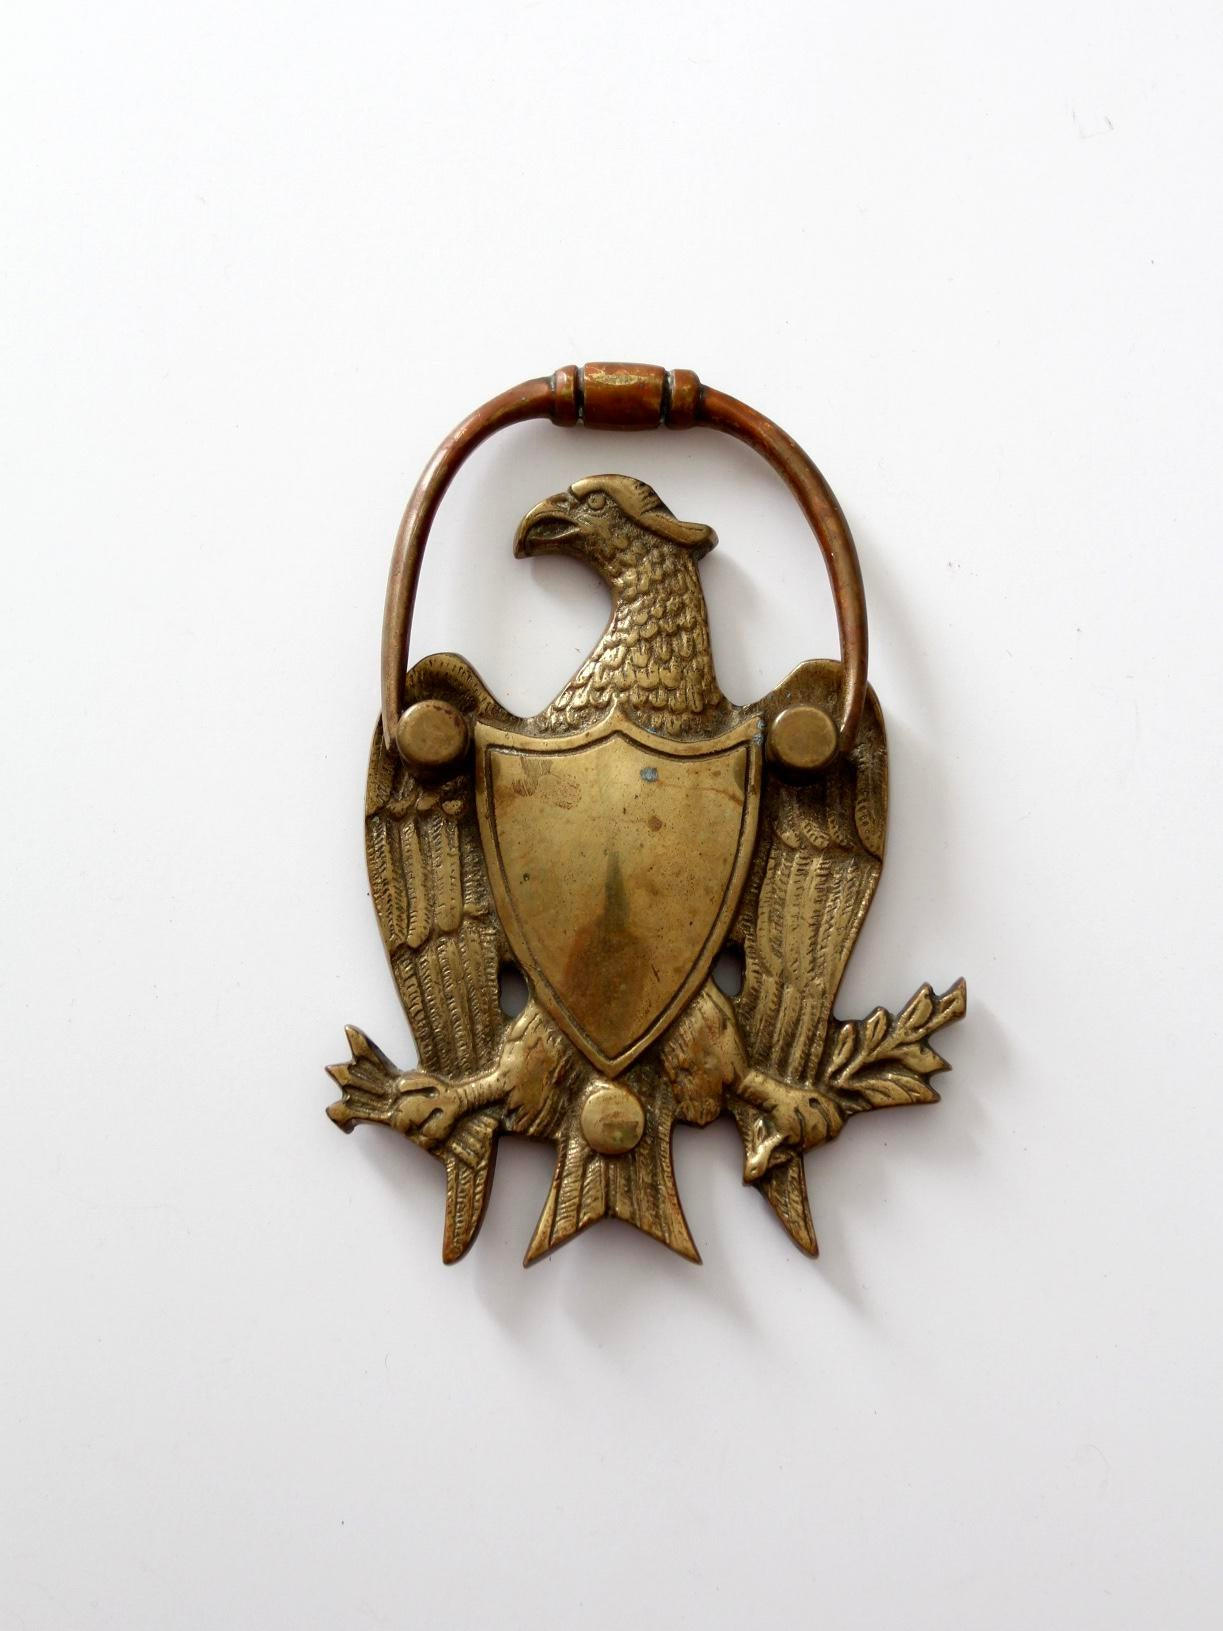 Charming Antique Brass Eagle Door Knocker For Sale   Image 4 Of 6